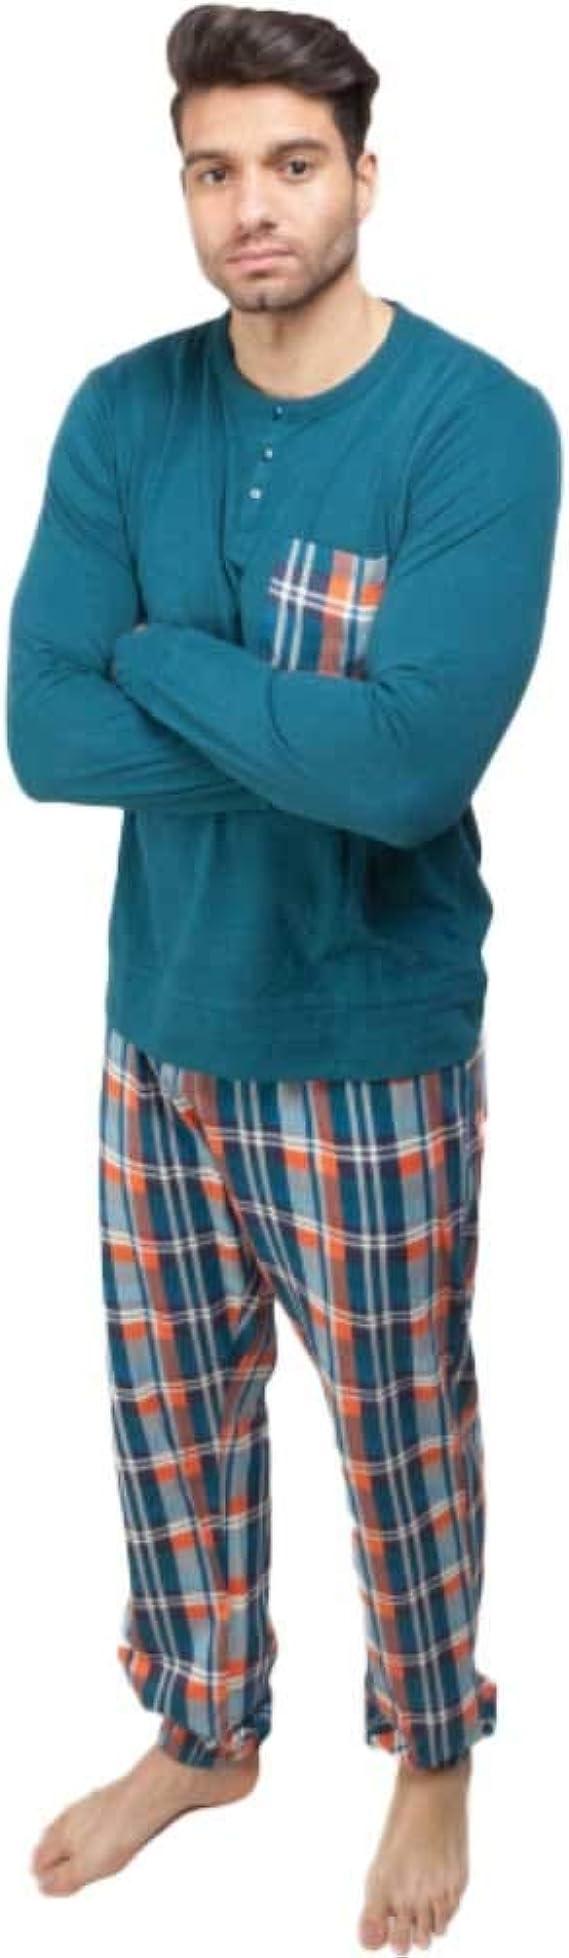 GISELA Pijama de Hombre en algodón 2/1559 - Azul, XL: Amazon ...